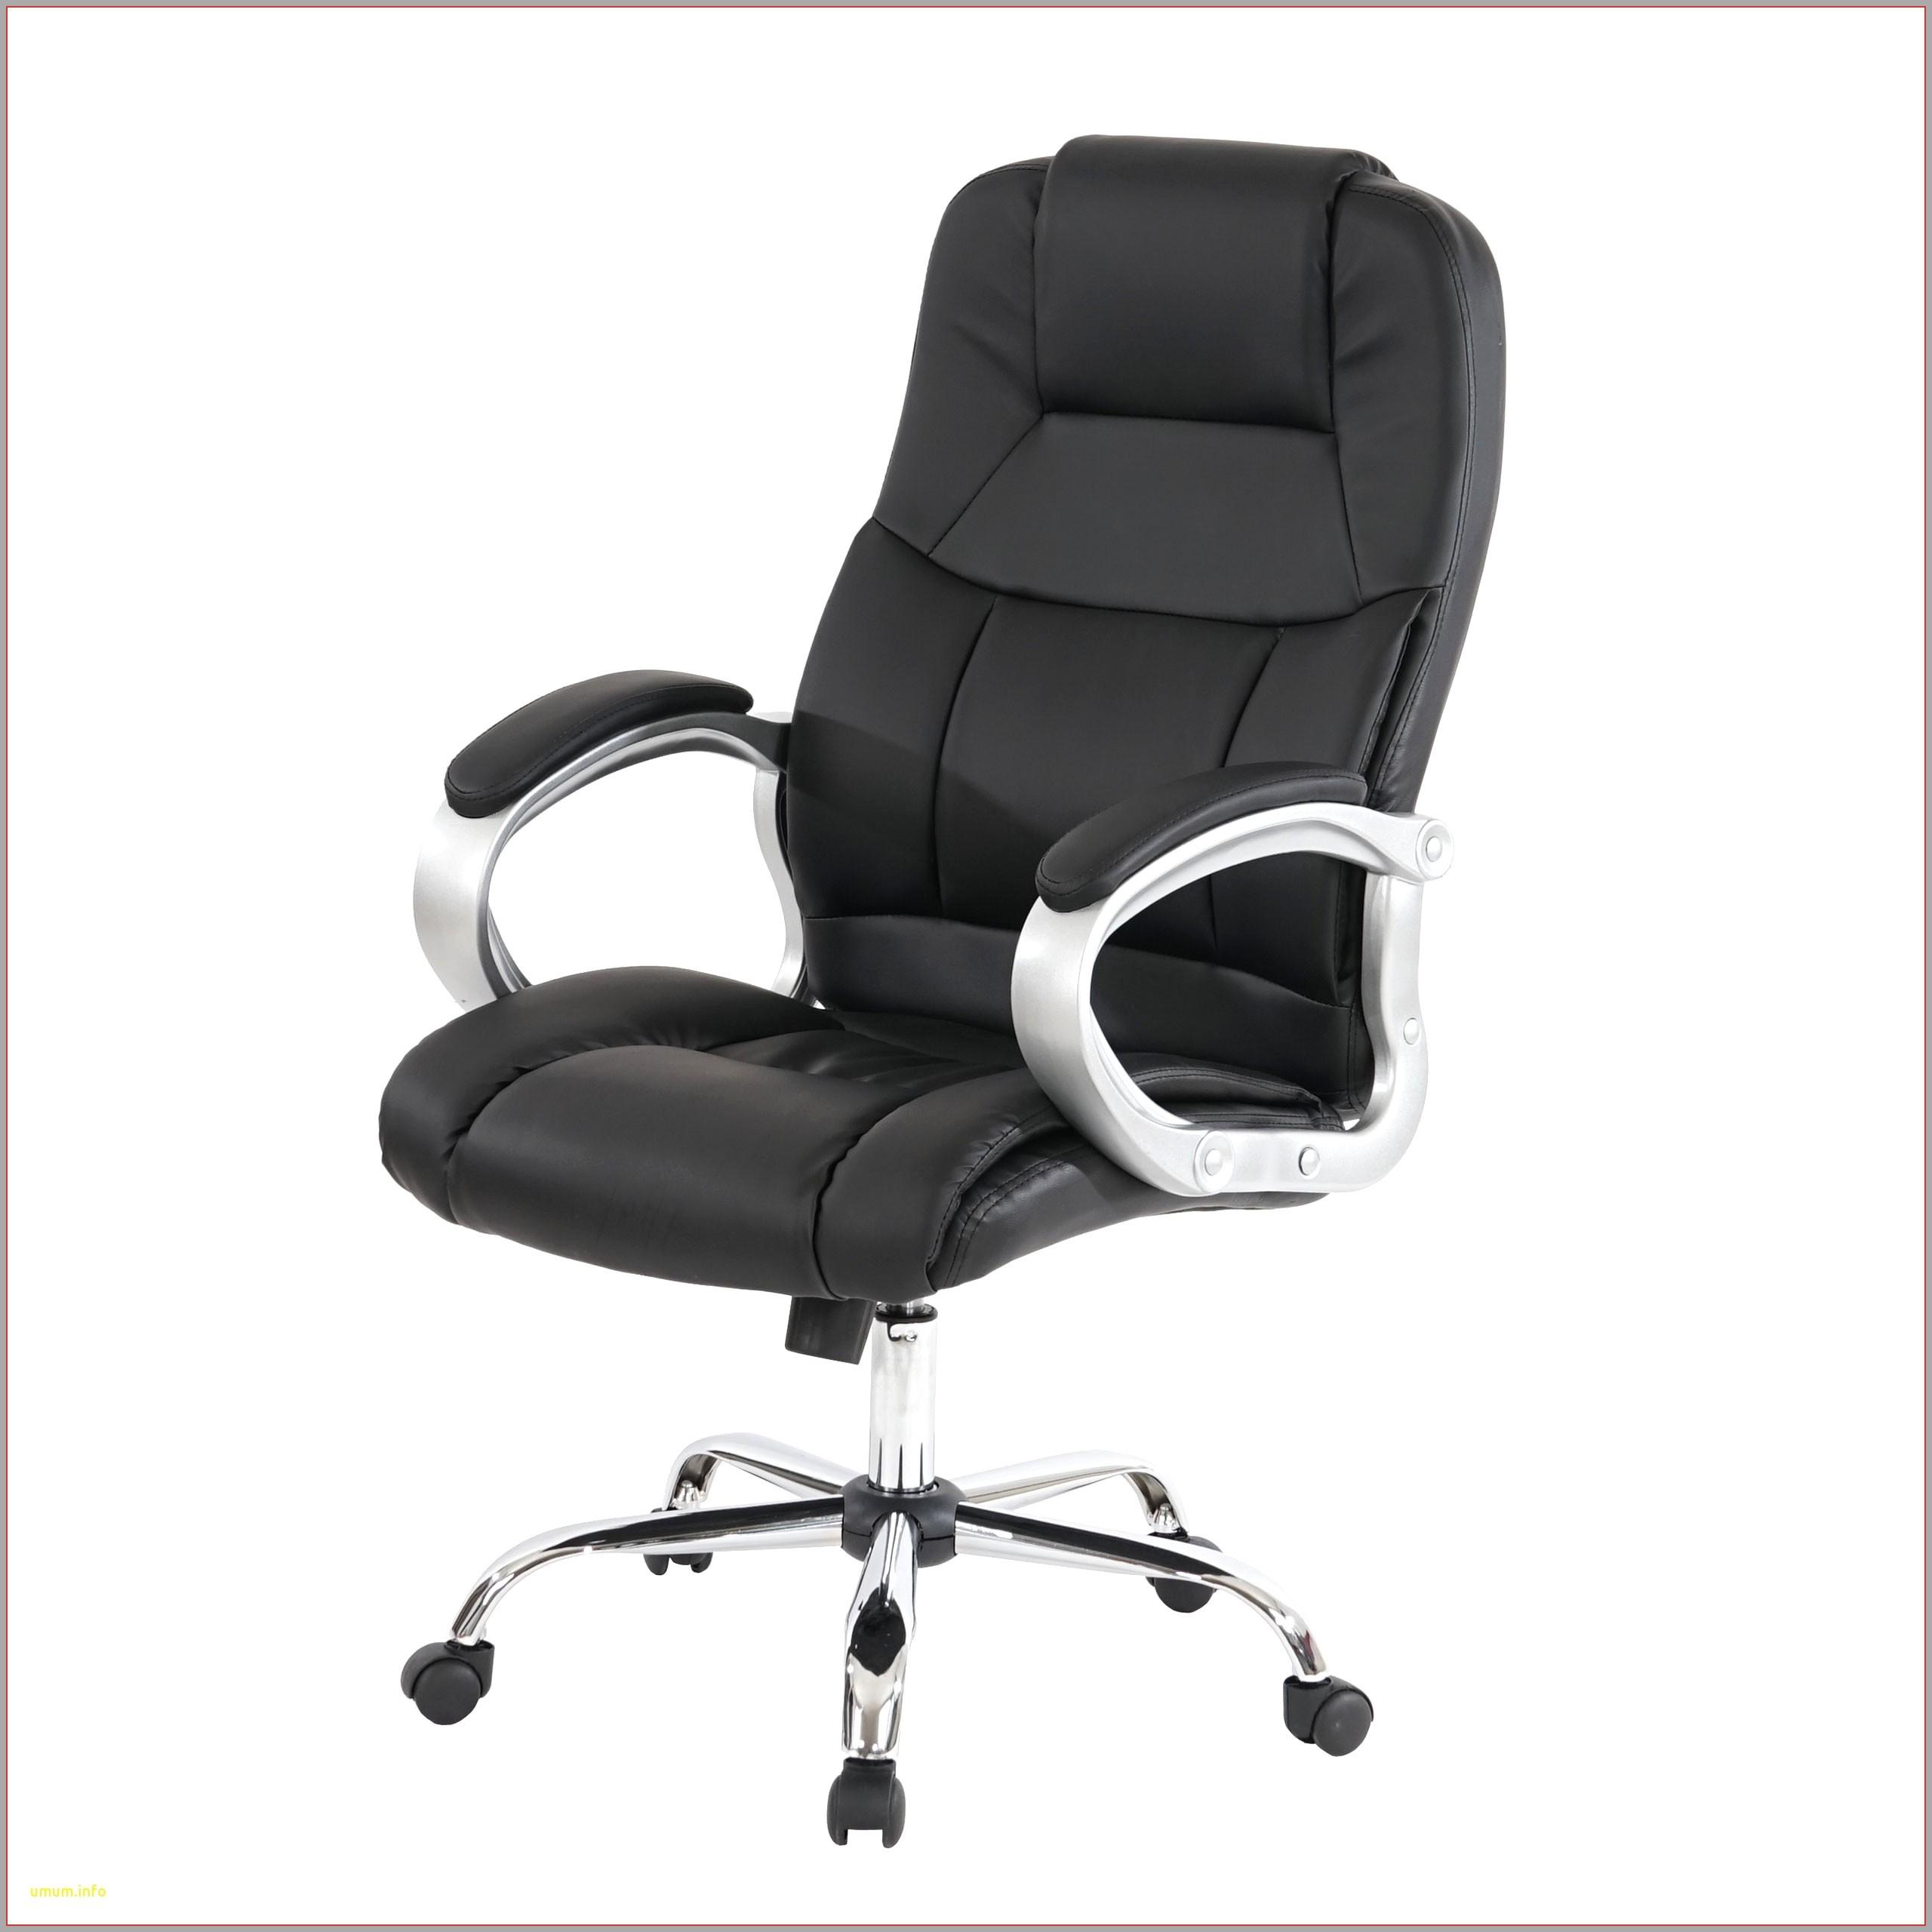 72 impressionnant stock de protection antiglisse fauteuil et canap. Black Bedroom Furniture Sets. Home Design Ideas